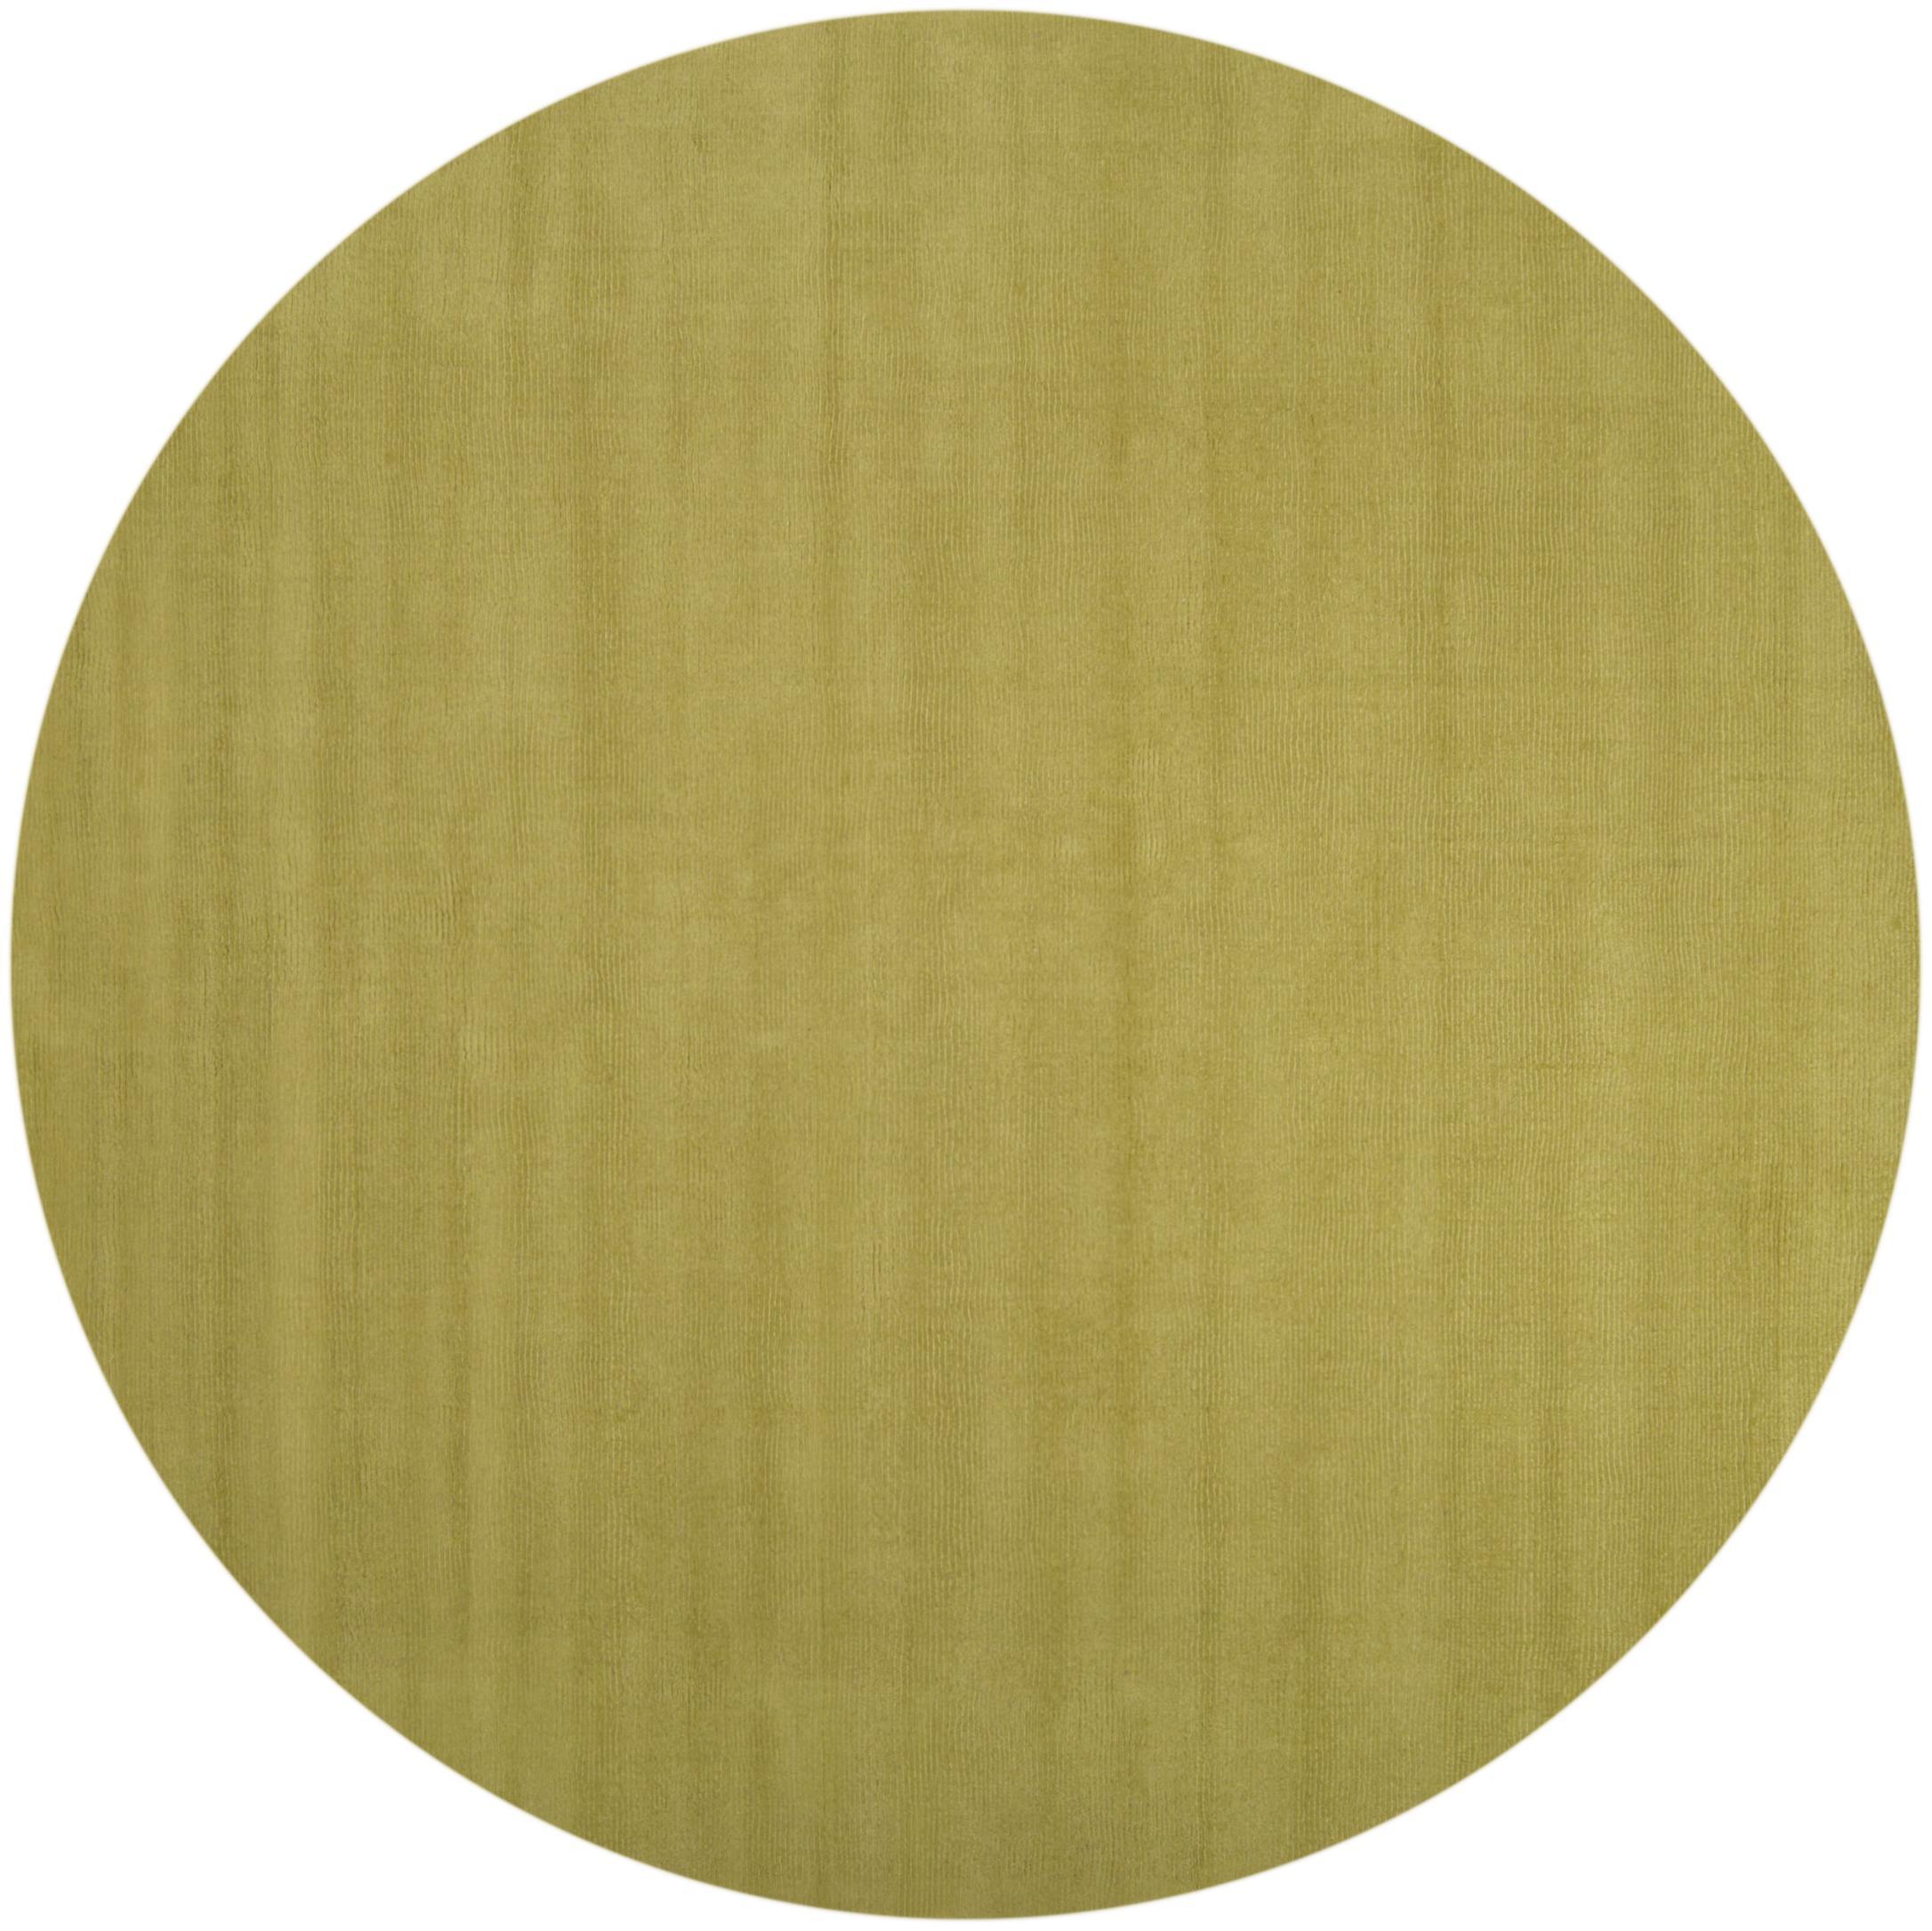 Surya Rugs Mystique 8' Round - Item Number: M337-8RD